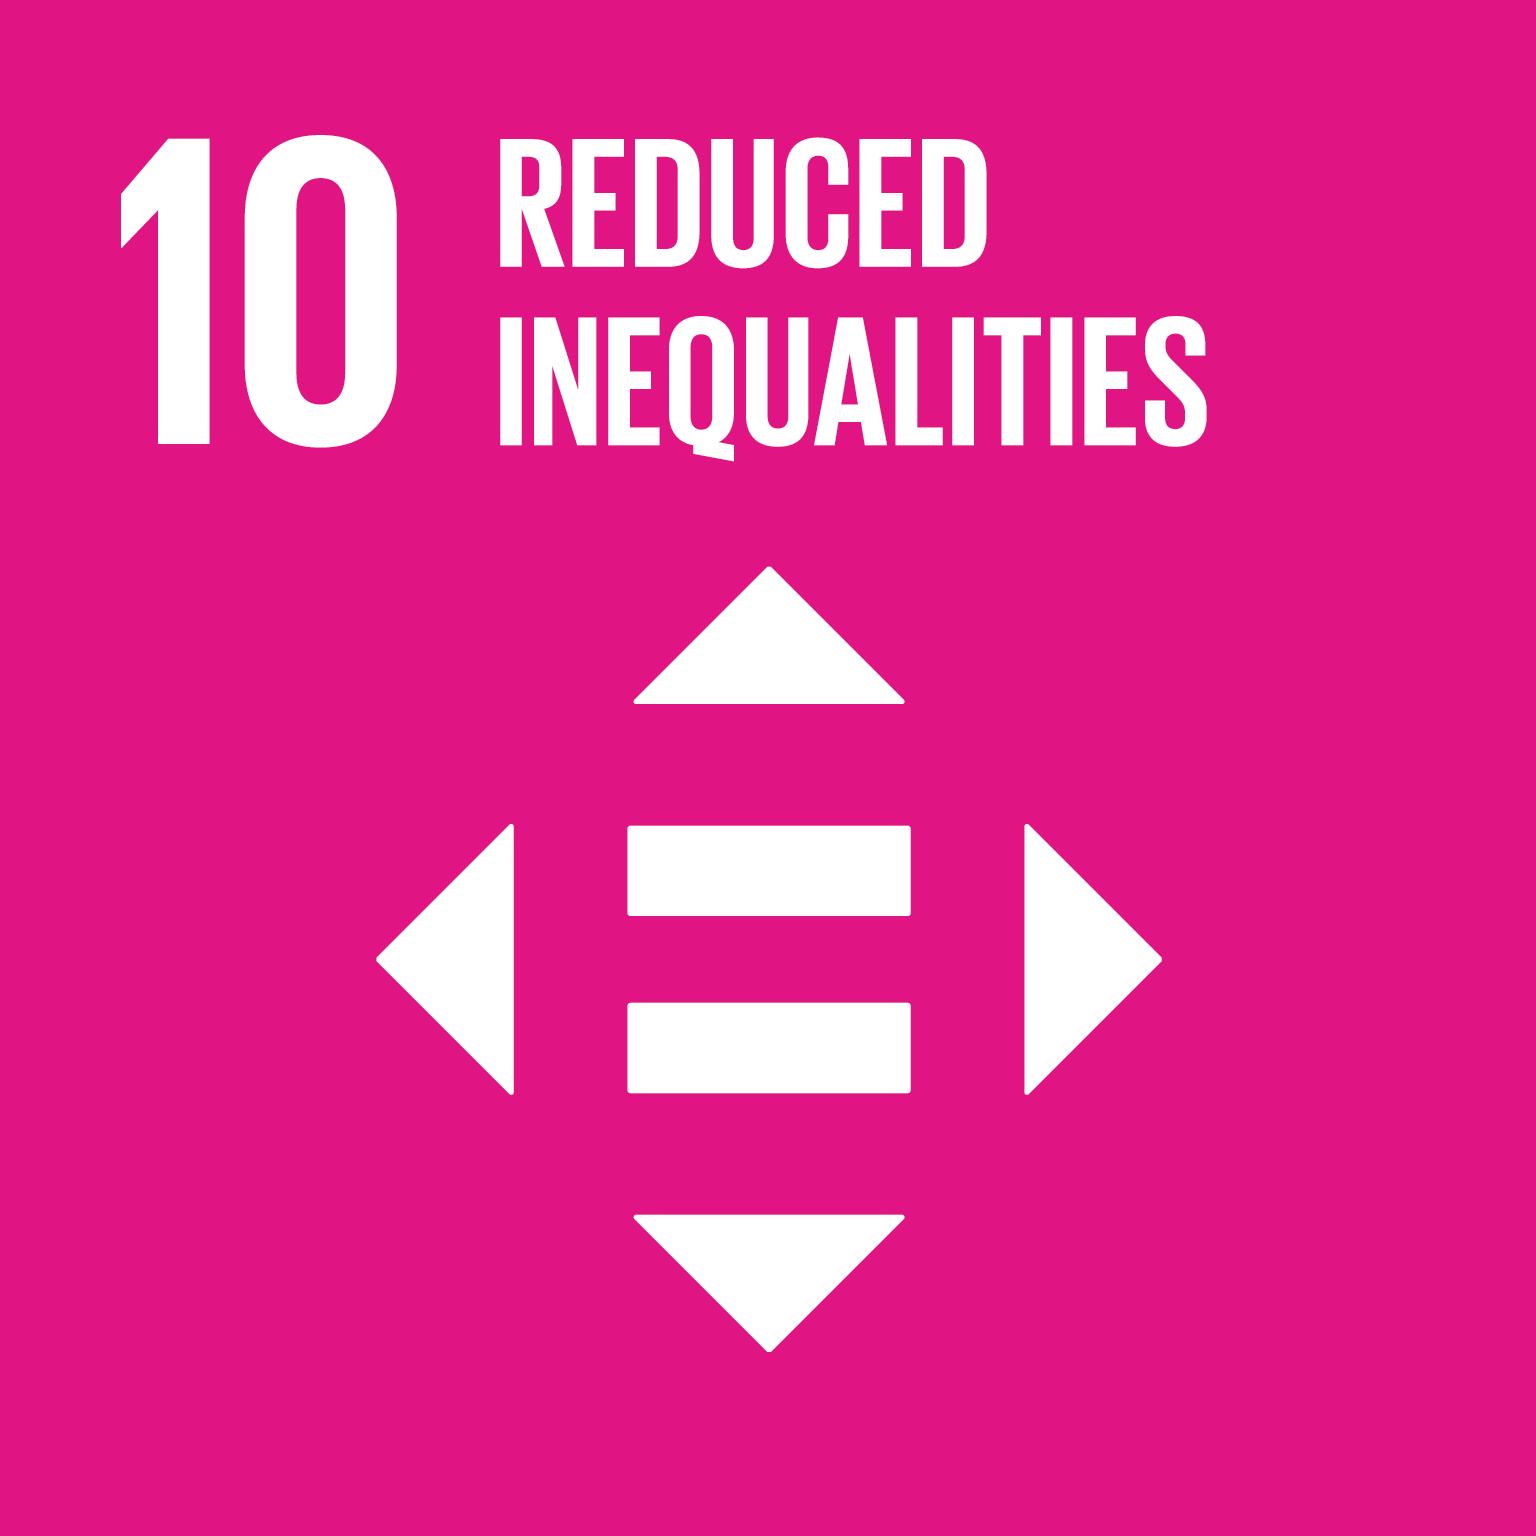 SDG, Reduced inequalities